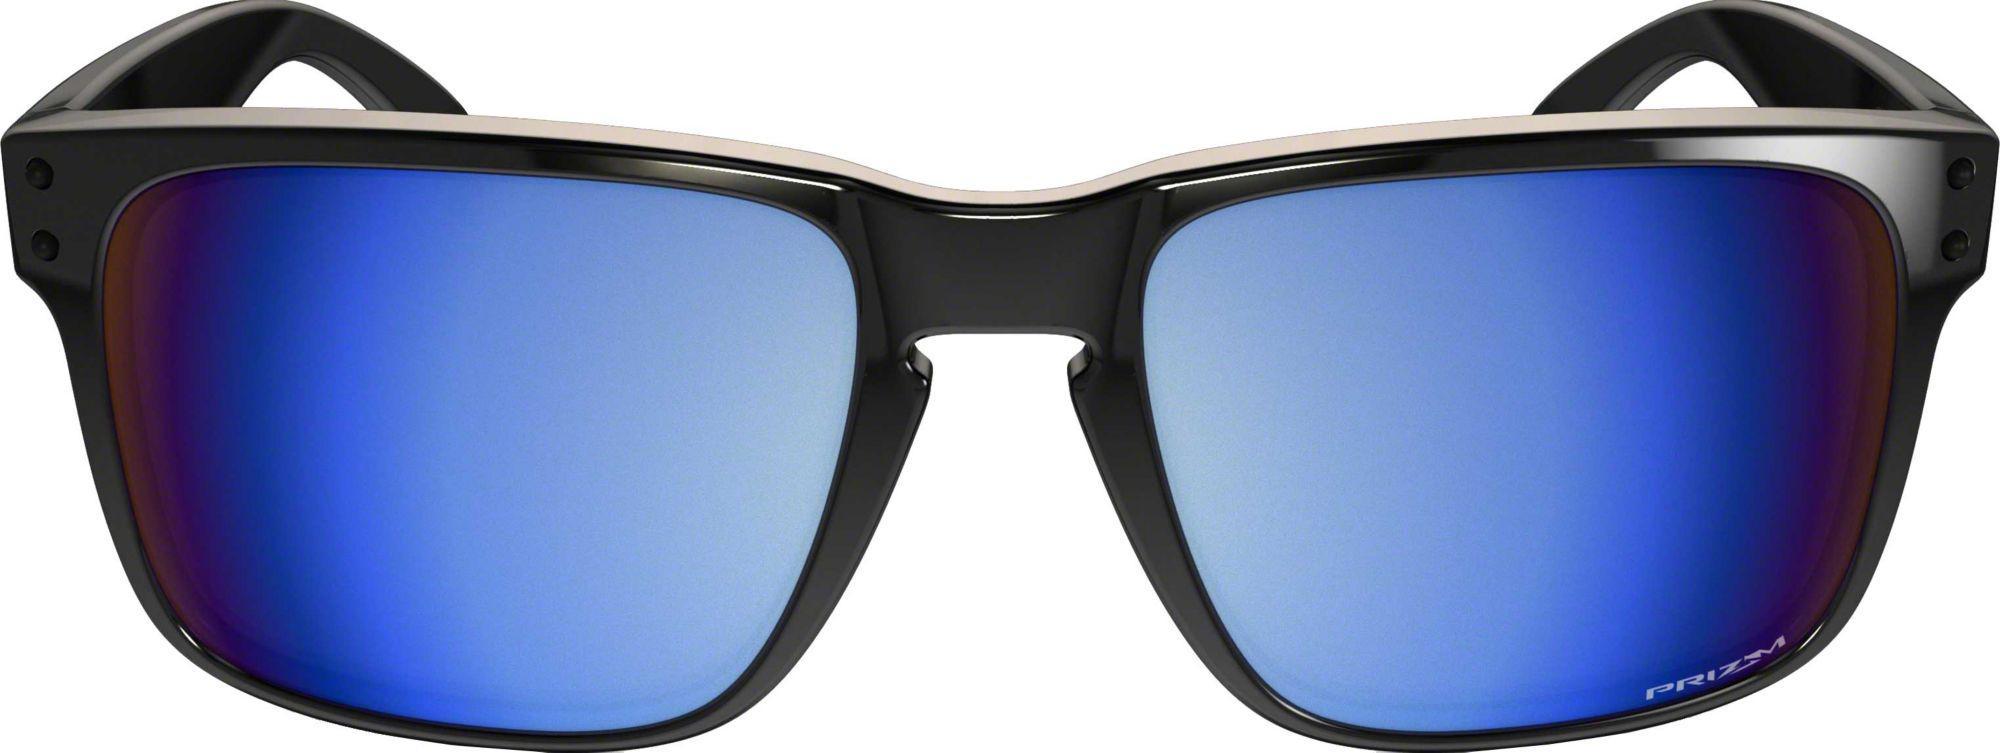 dee8d318a8 ... spain oakley black holbrook prizm deep water polarized sunglasses for  men lyst. view fullscreen 29a32